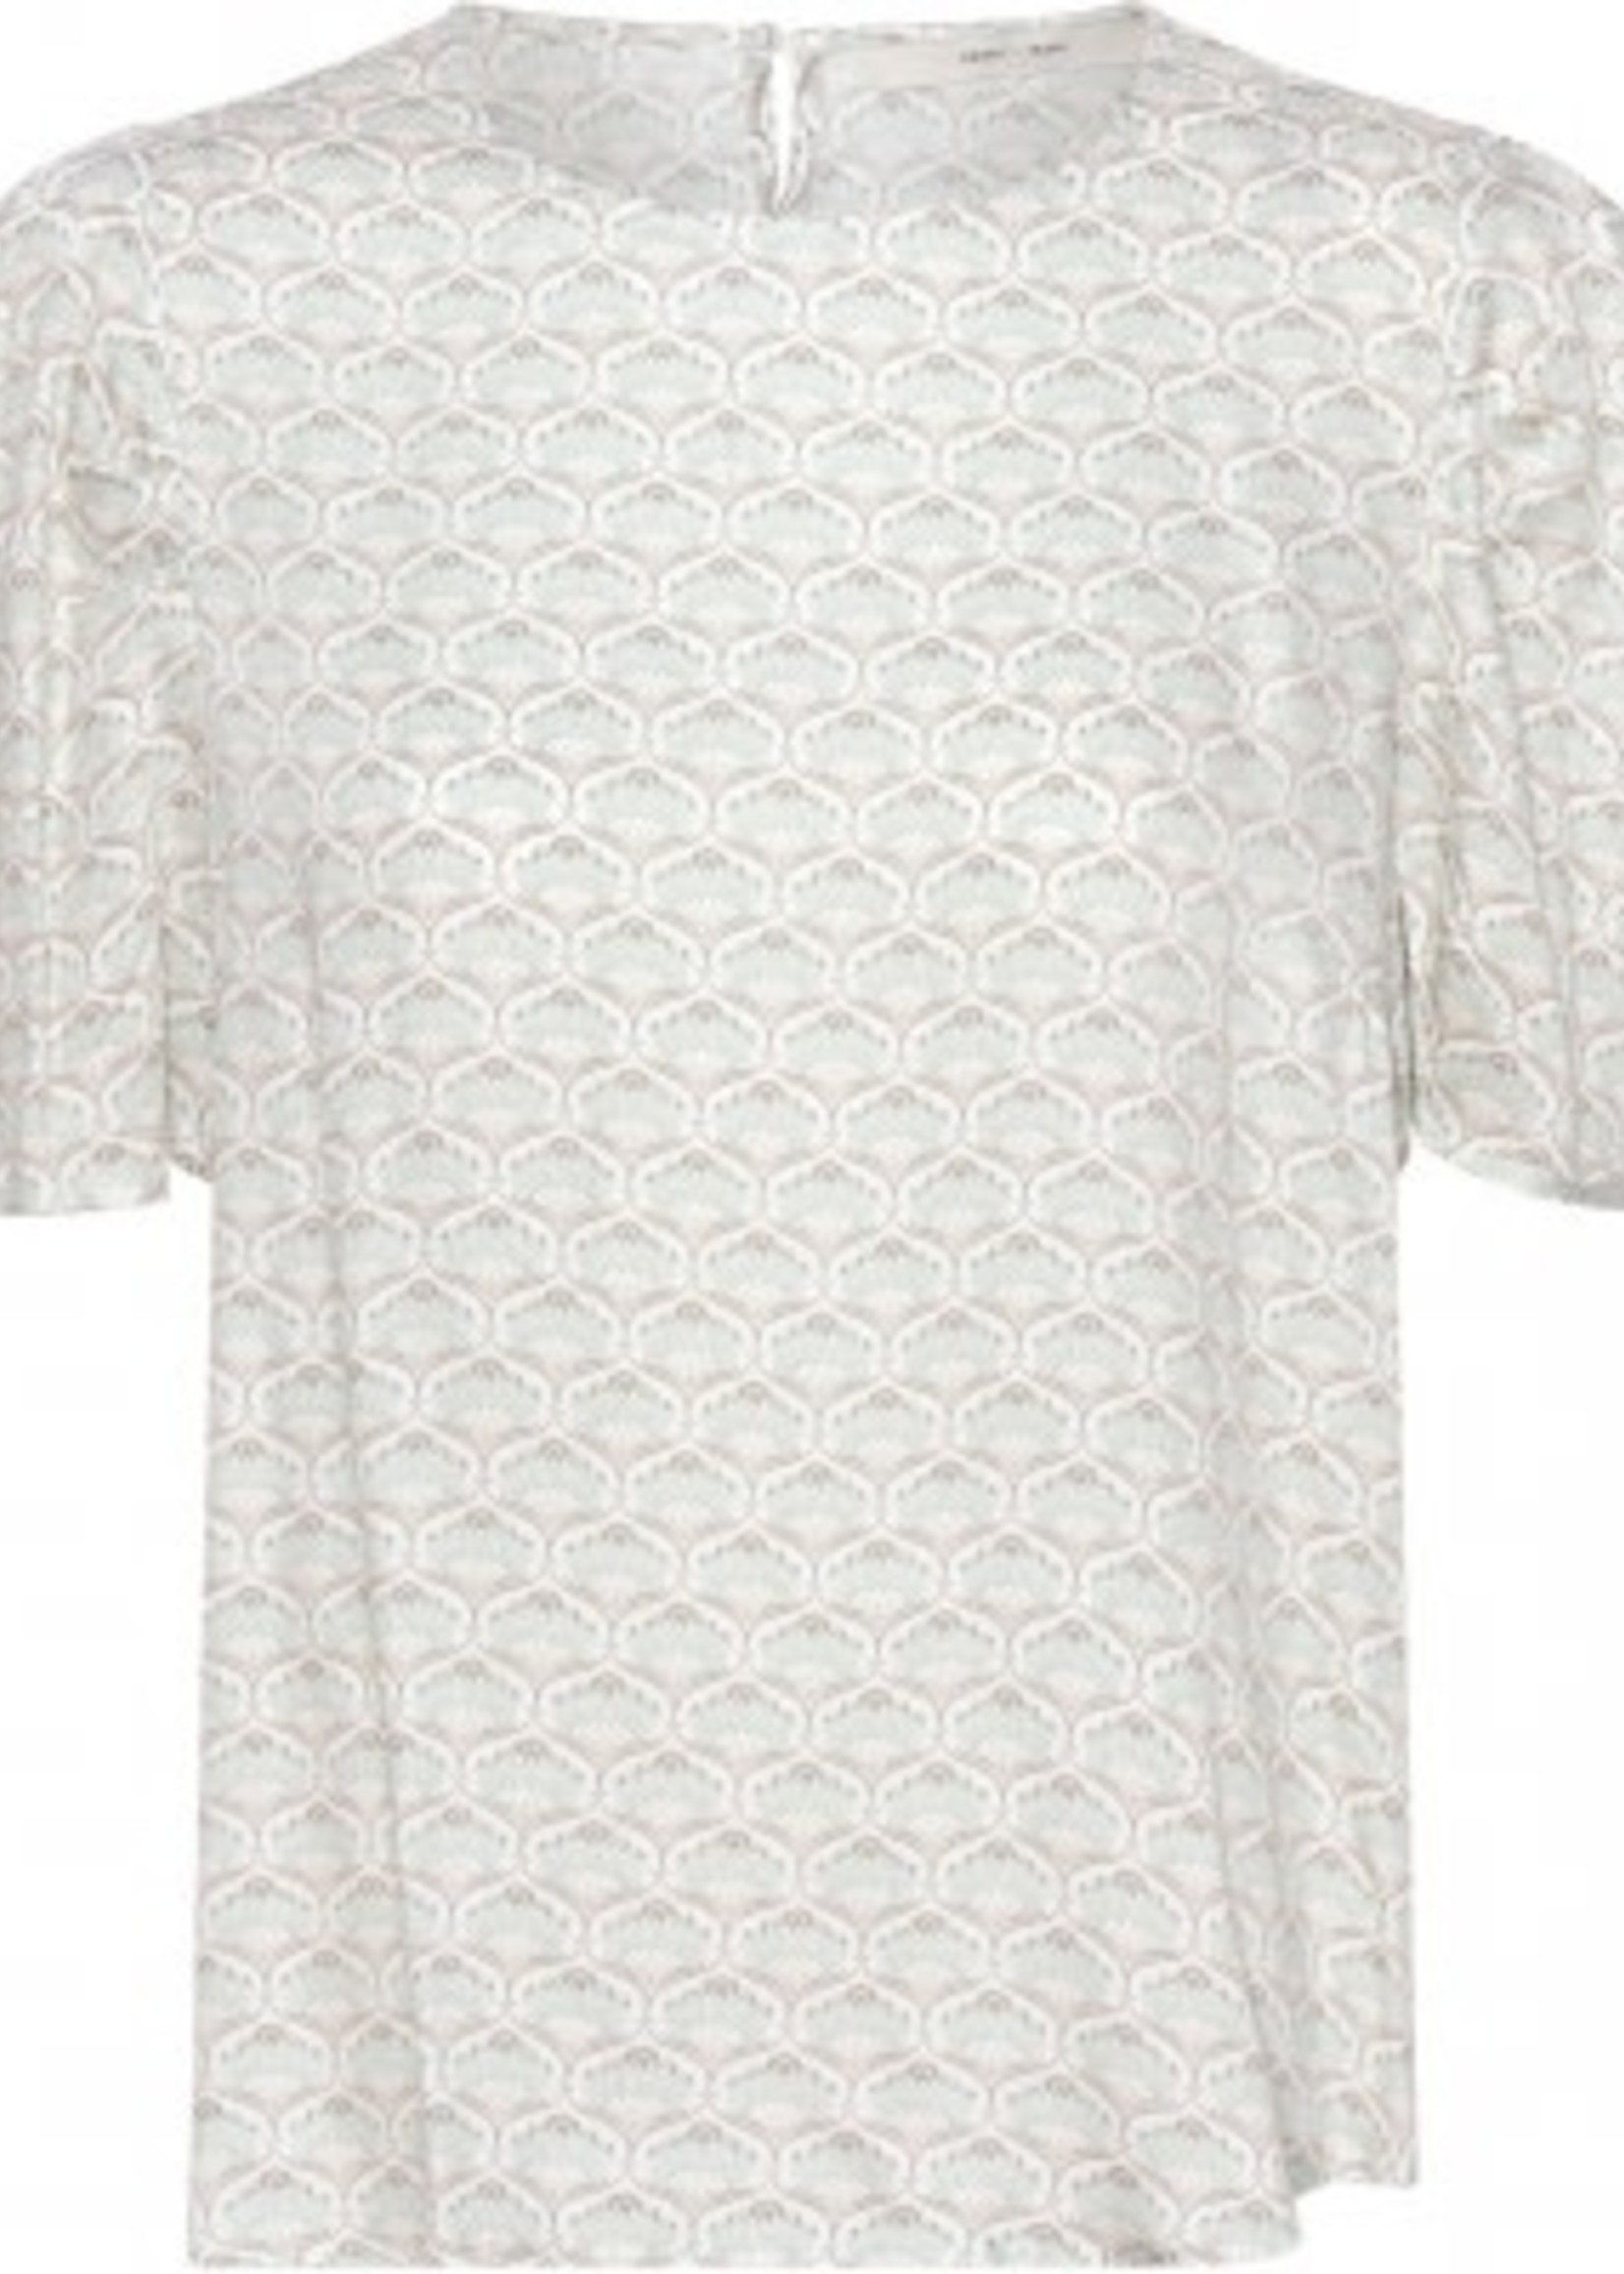 COSTAMANI Bettie blouse mint